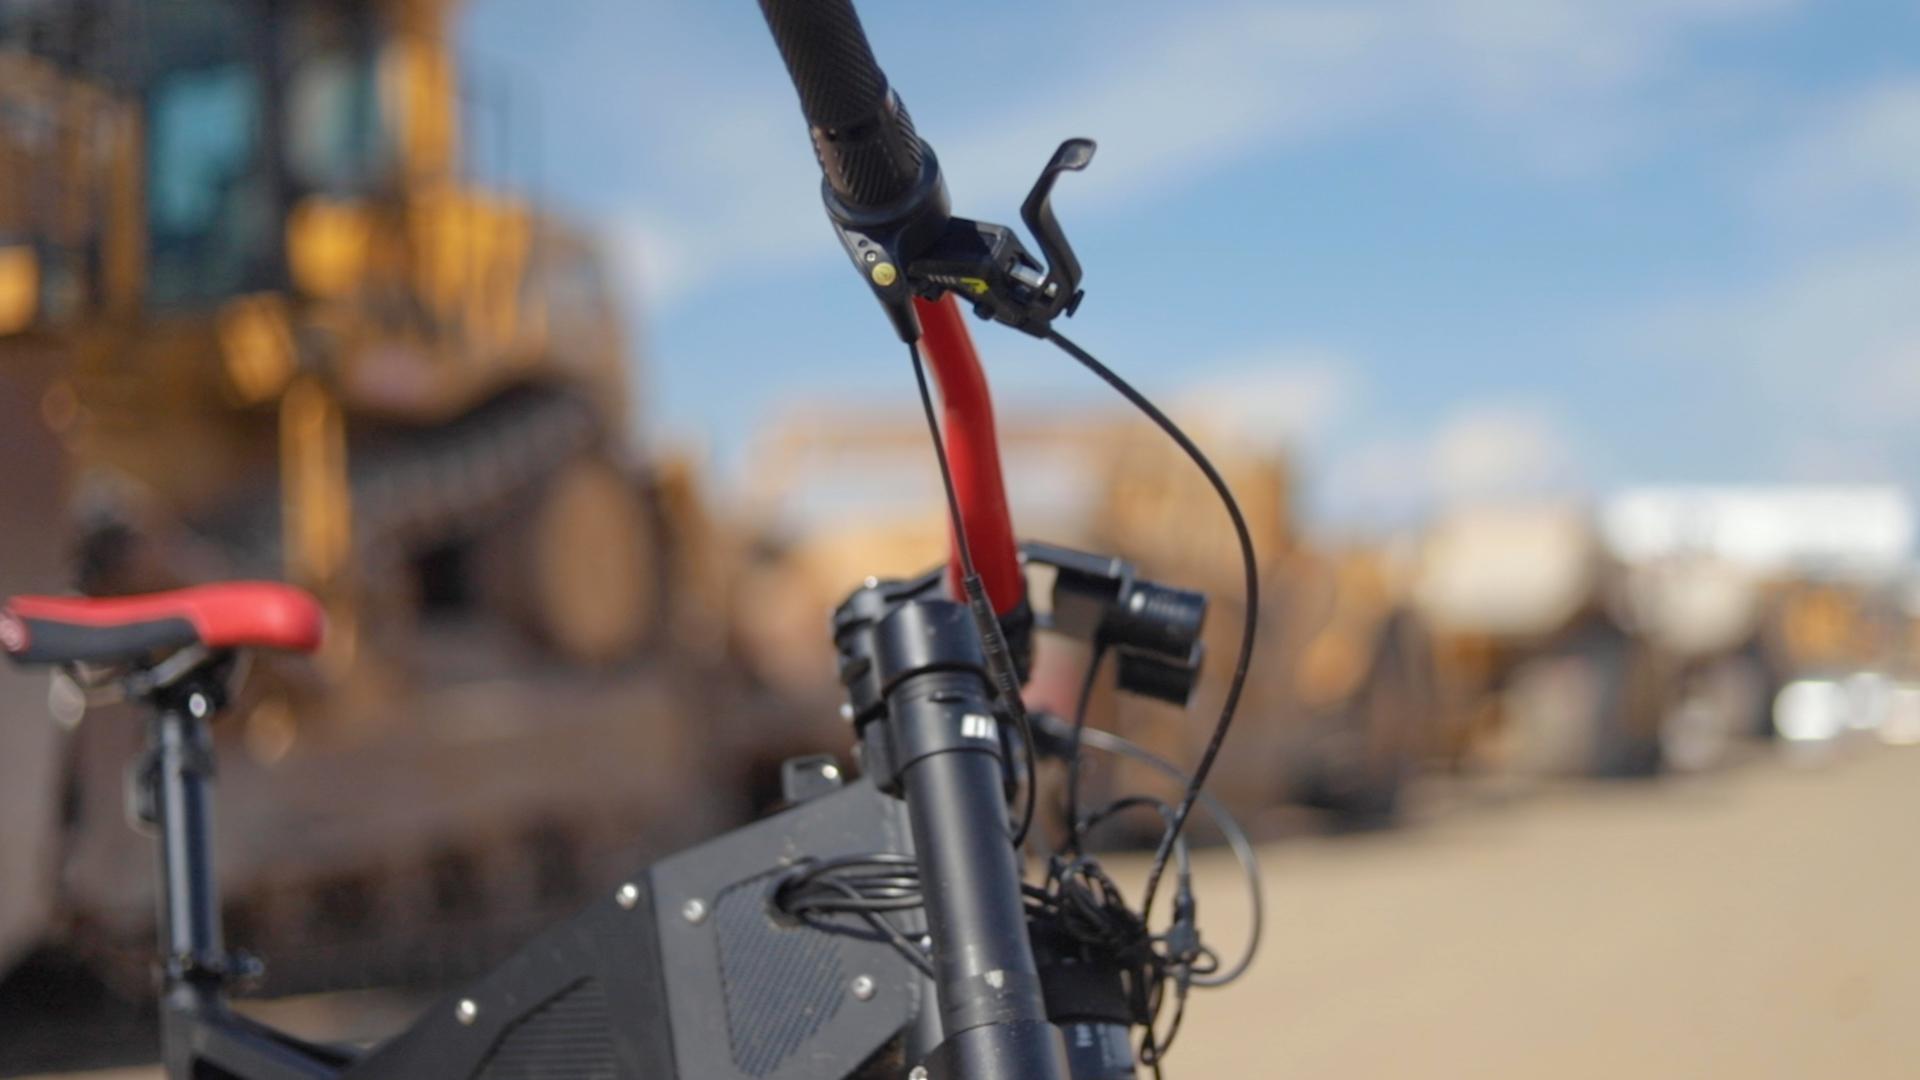 electrified-reviews-stealth-b52-bomber-electric-bike-review-brake-lever.jpg